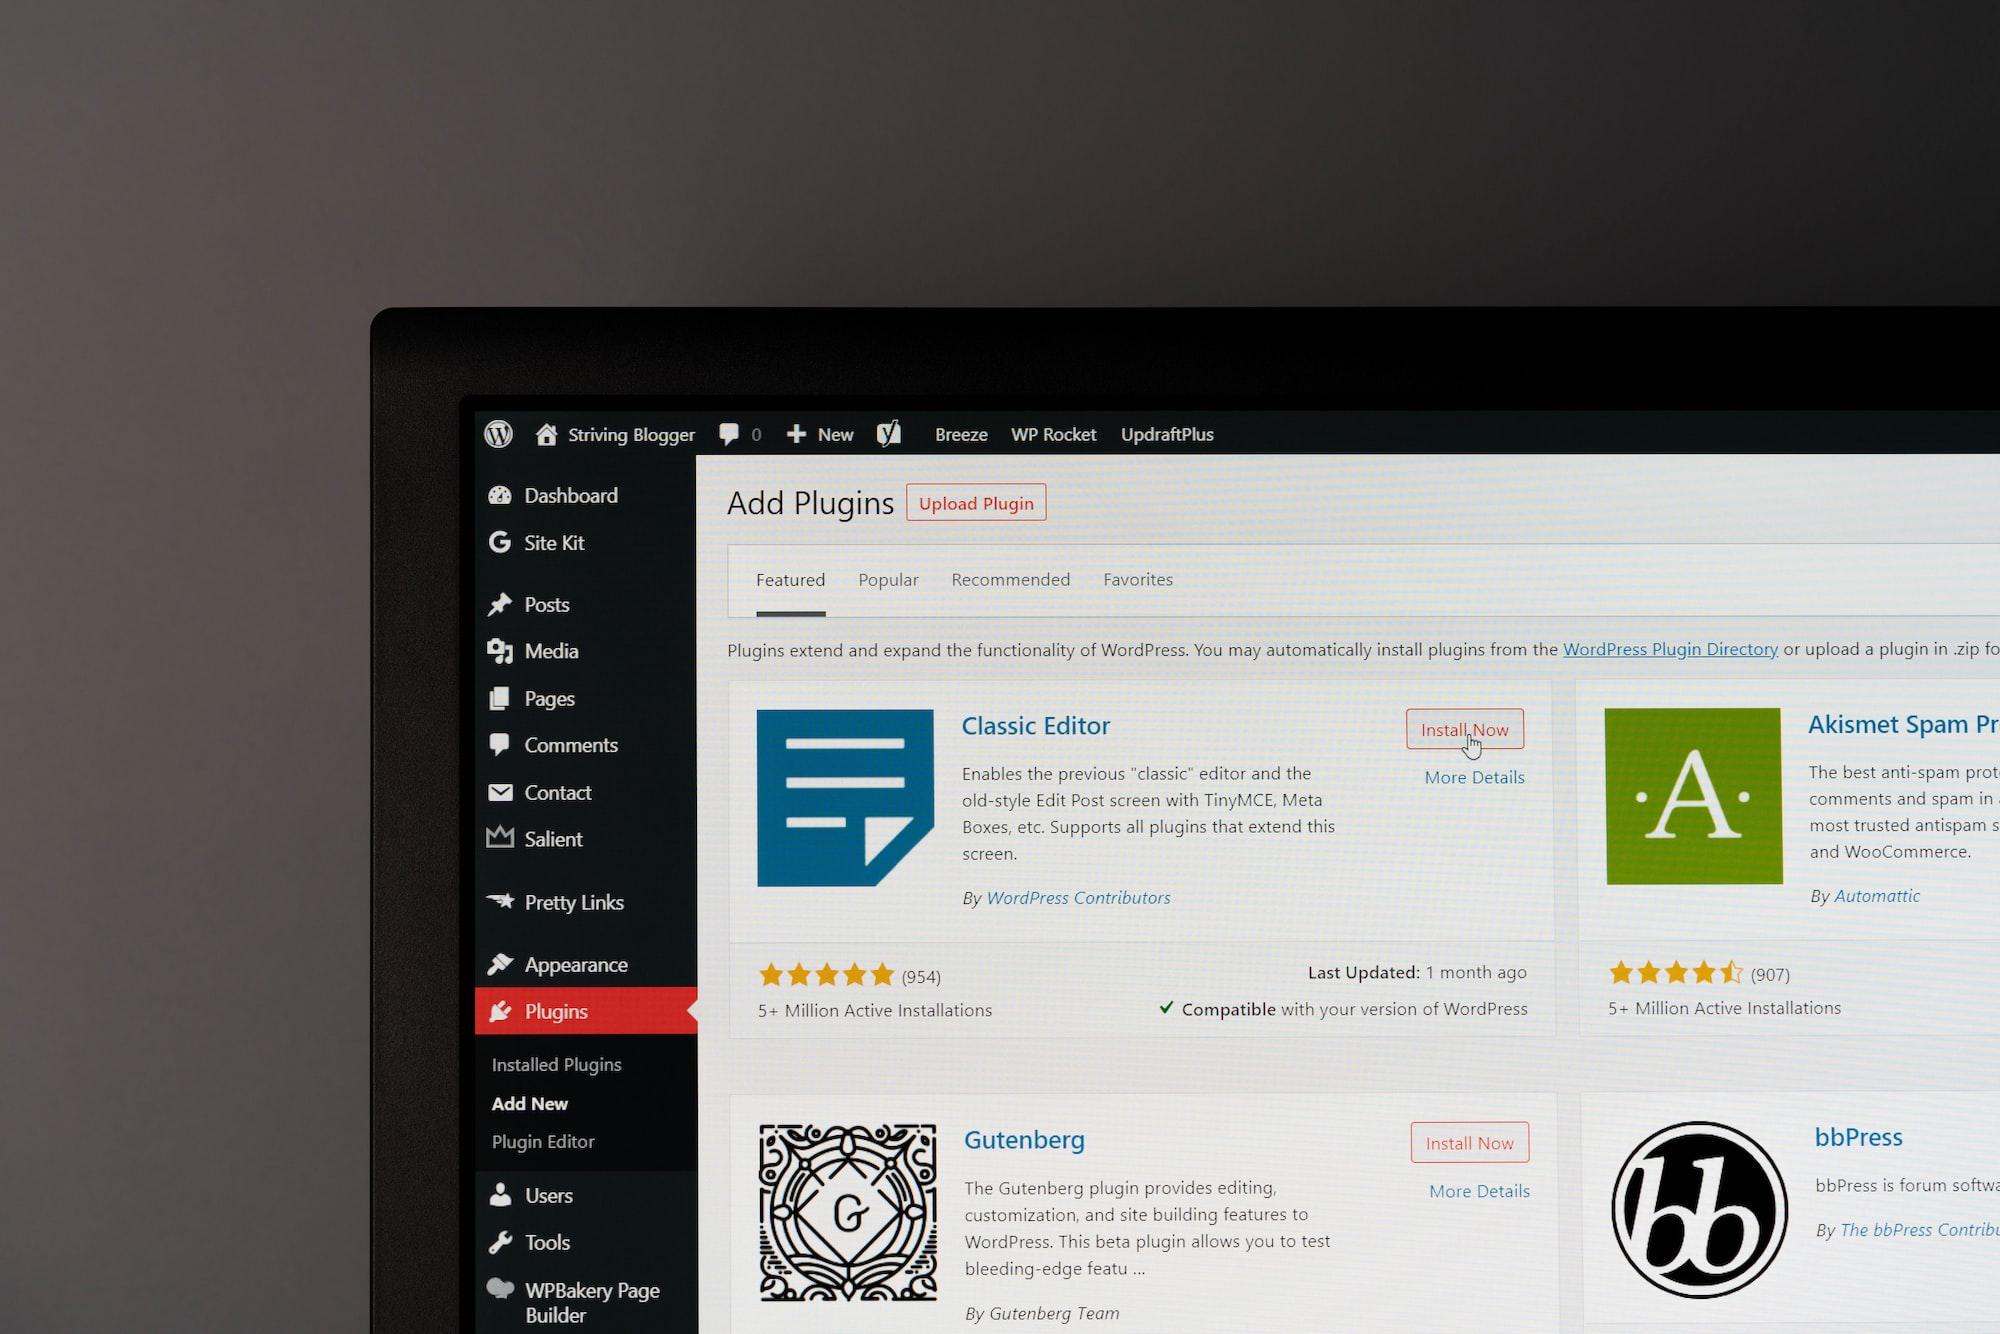 Add Plugins page on WordPress.